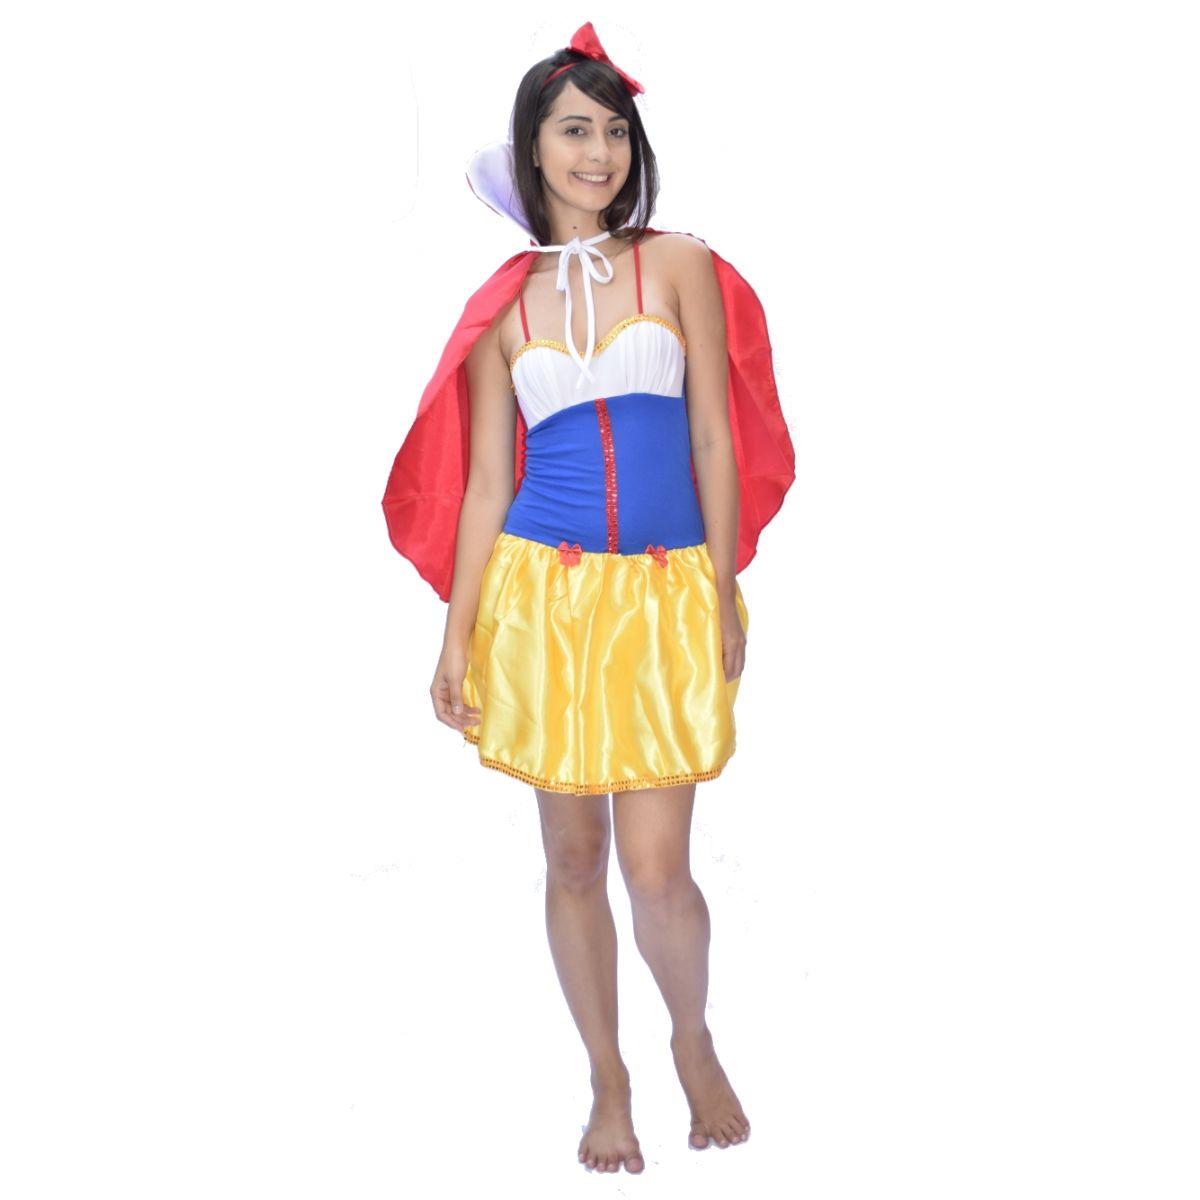 Fantasia Branca De Neve - Princesa Da Disney - Adulto - fantasia para festa carnaval - point da dança